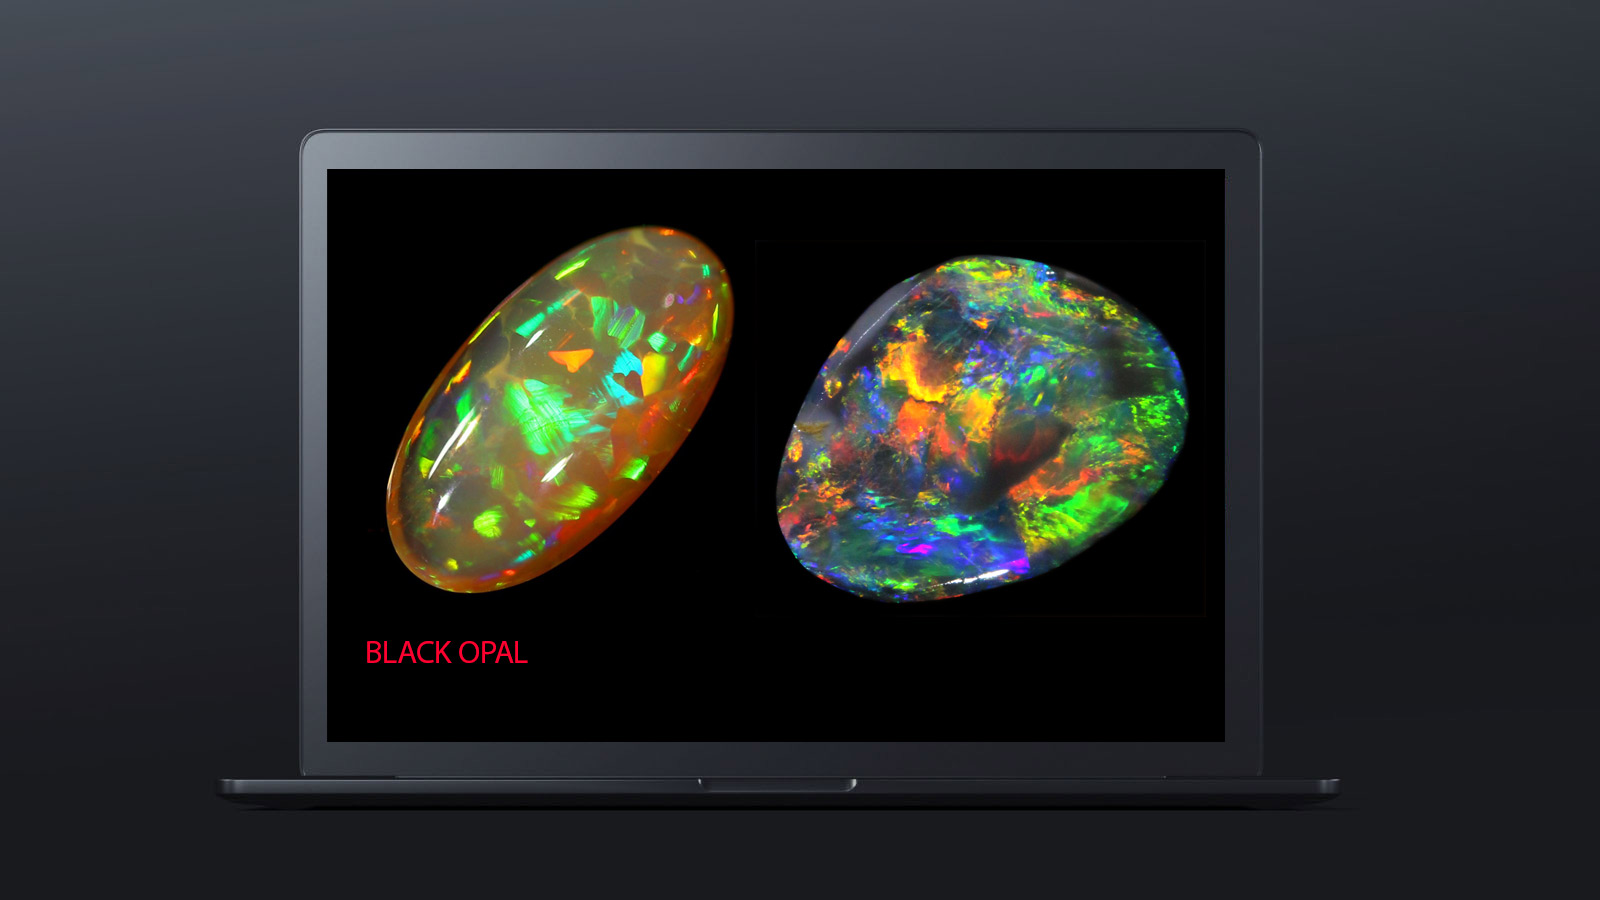 10 worlds rarest gemstones BLACK OPAL 2 - ده گوهر کمیاب دنیا کدامند؟